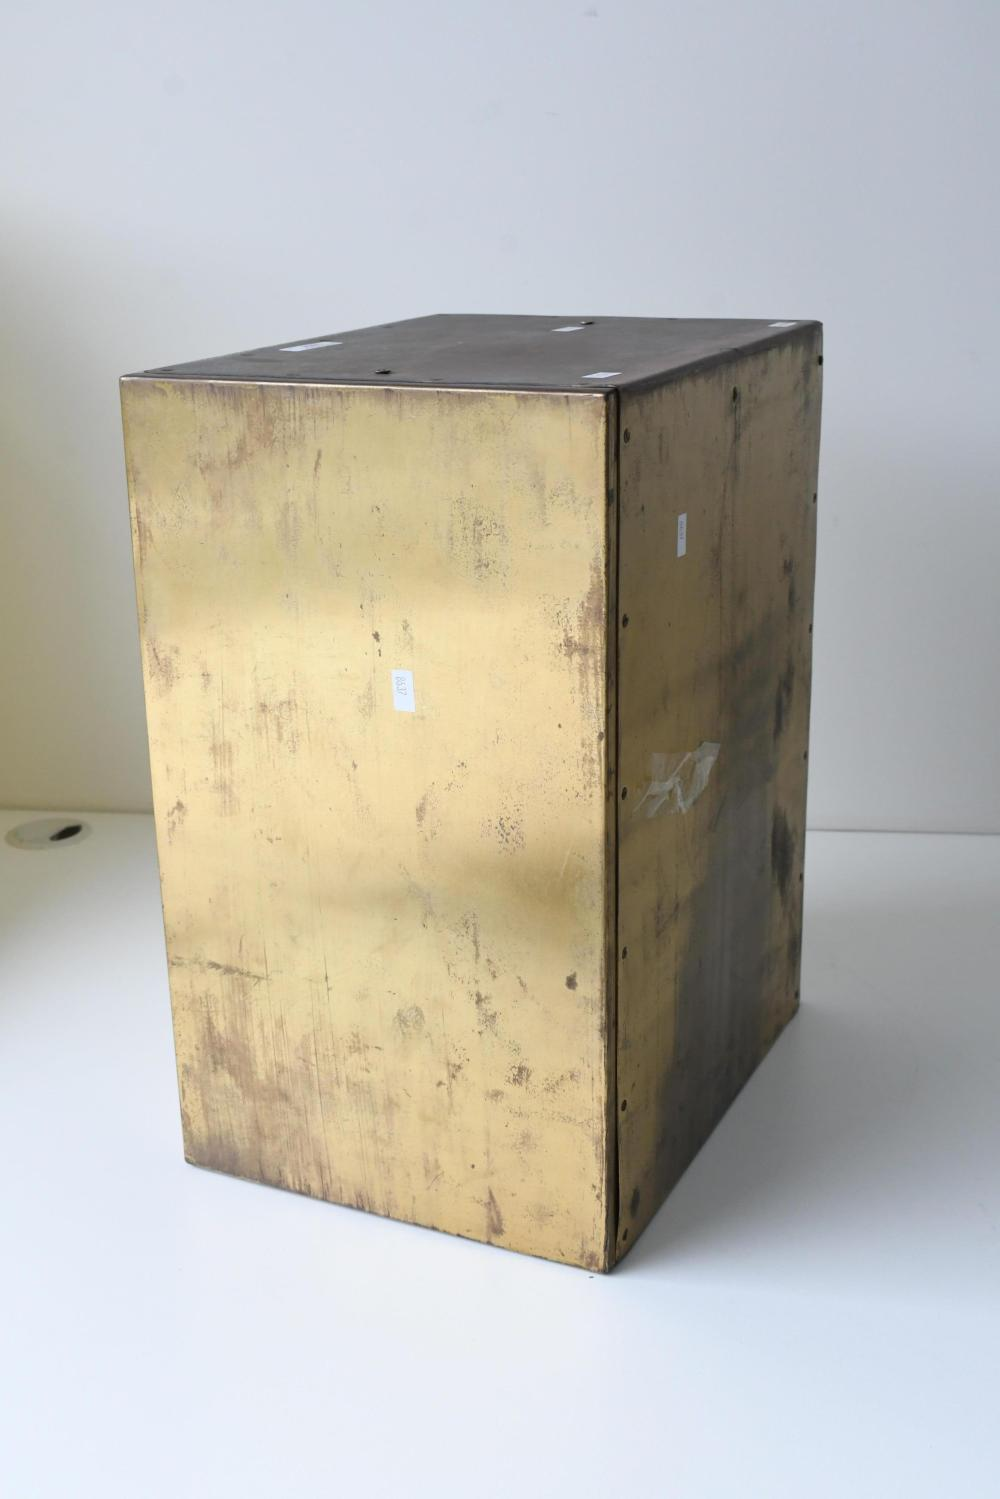 Vintage original brass tabernacle safe 43 x 33 x 26 cm. (16.93 x 12.99 x 10.24 in.)